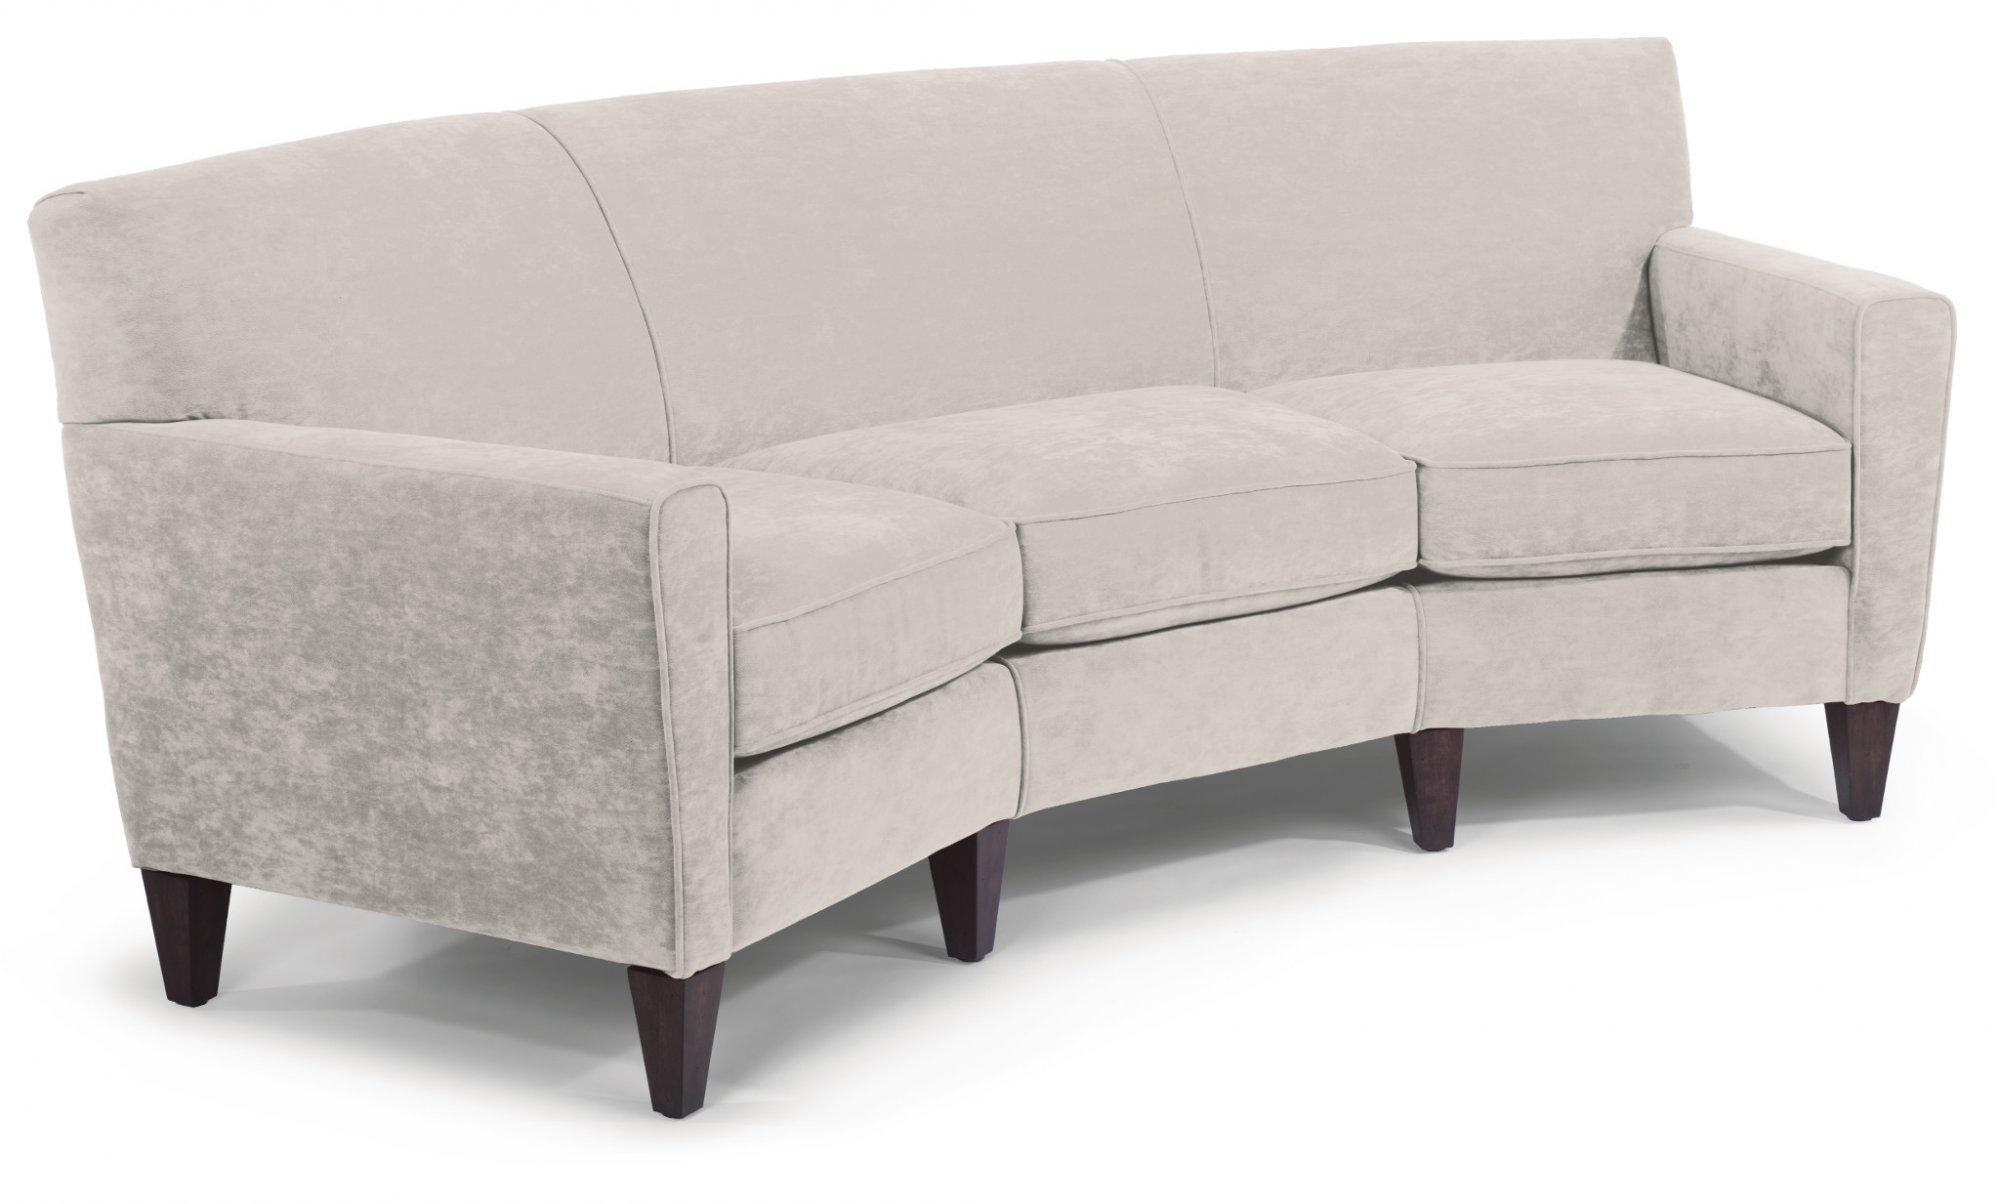 Mathis Leather Conversation Sofa